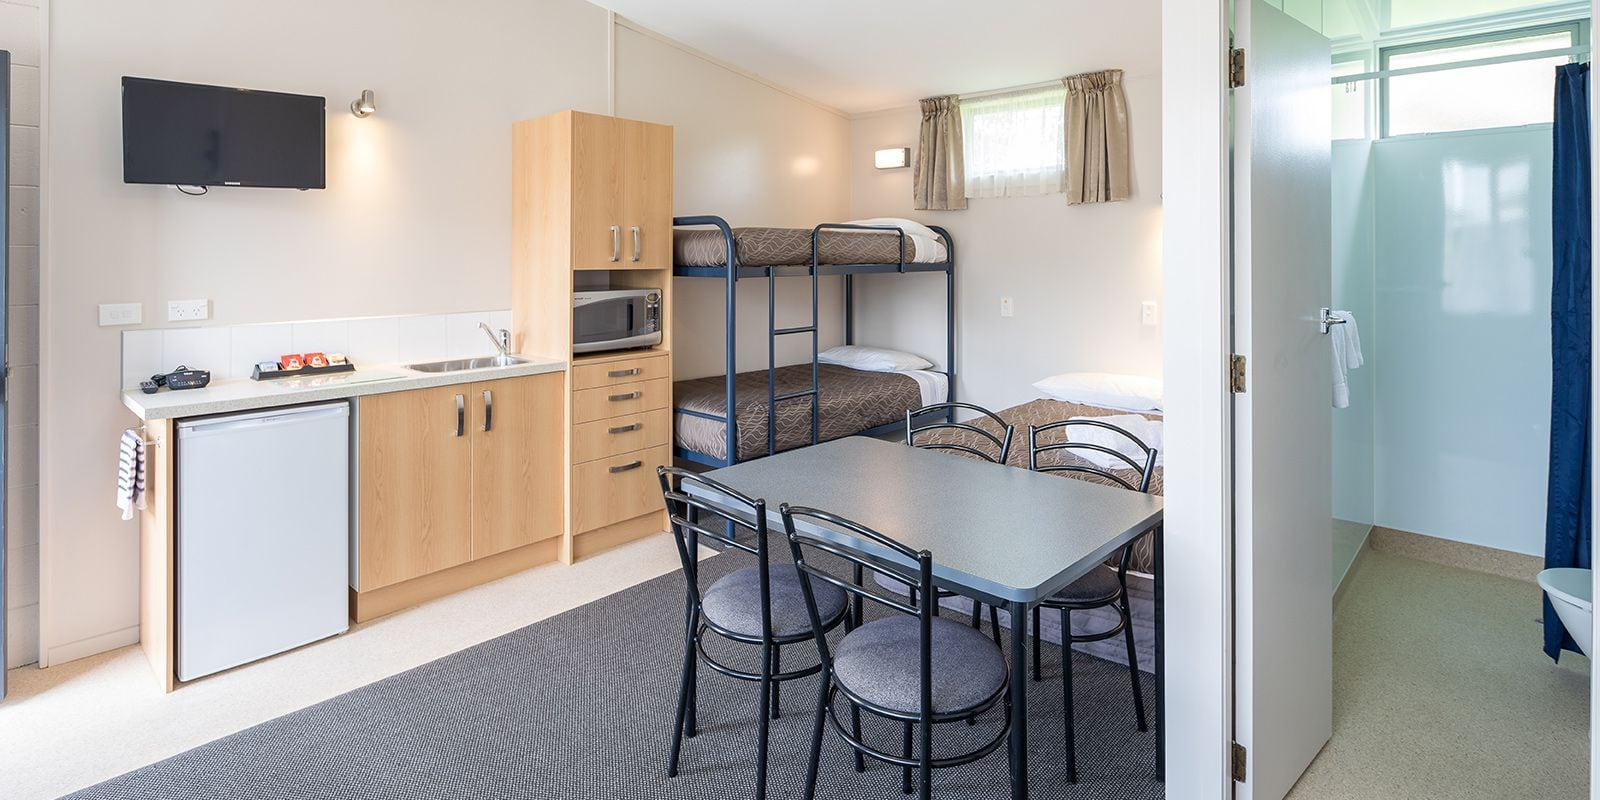 Studio Accommodation At Amber Kiwi Holiday Park In Christchurch